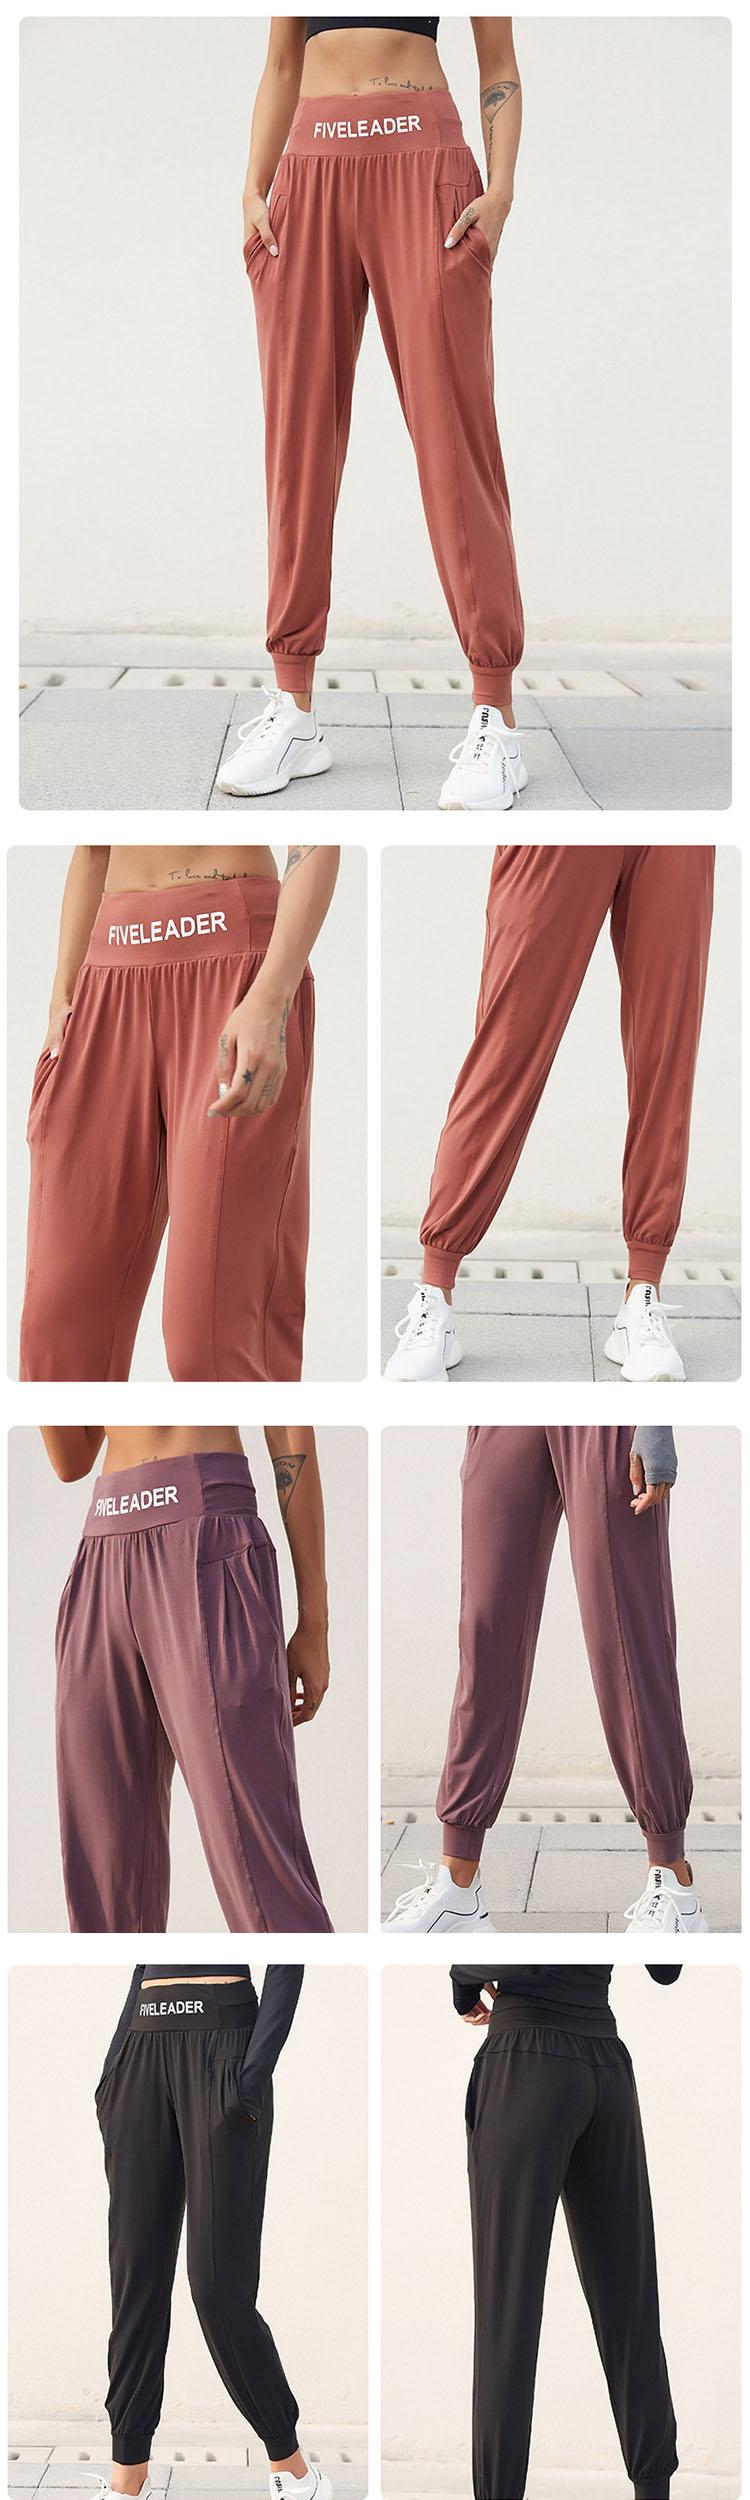 Fashion letter widened girdle design, abdomen is thinner.